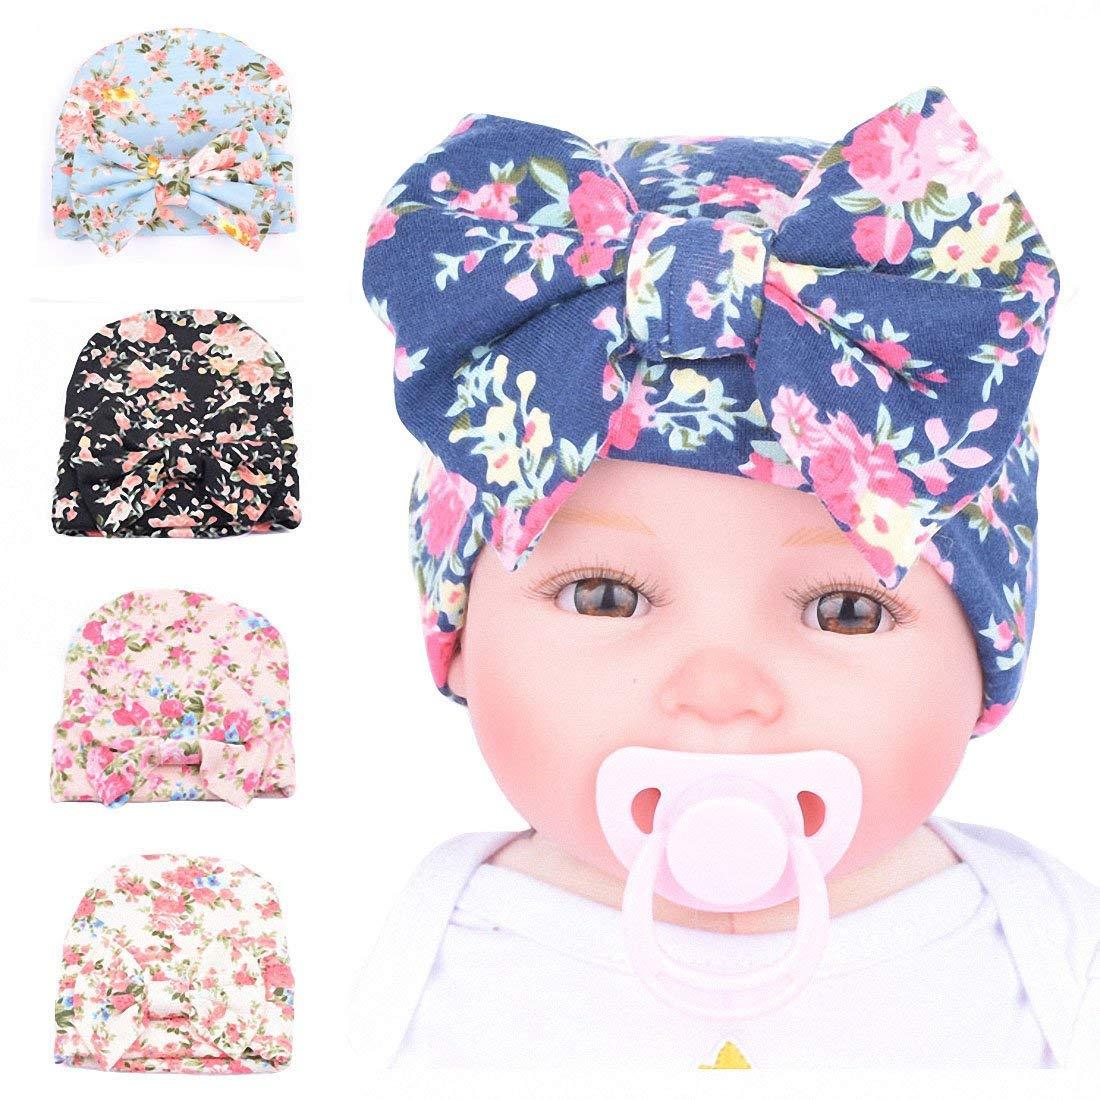 papala 5 Pcs Printed Newborn Baby Girls Nursery Beanie Hospital Hat With Big Bow